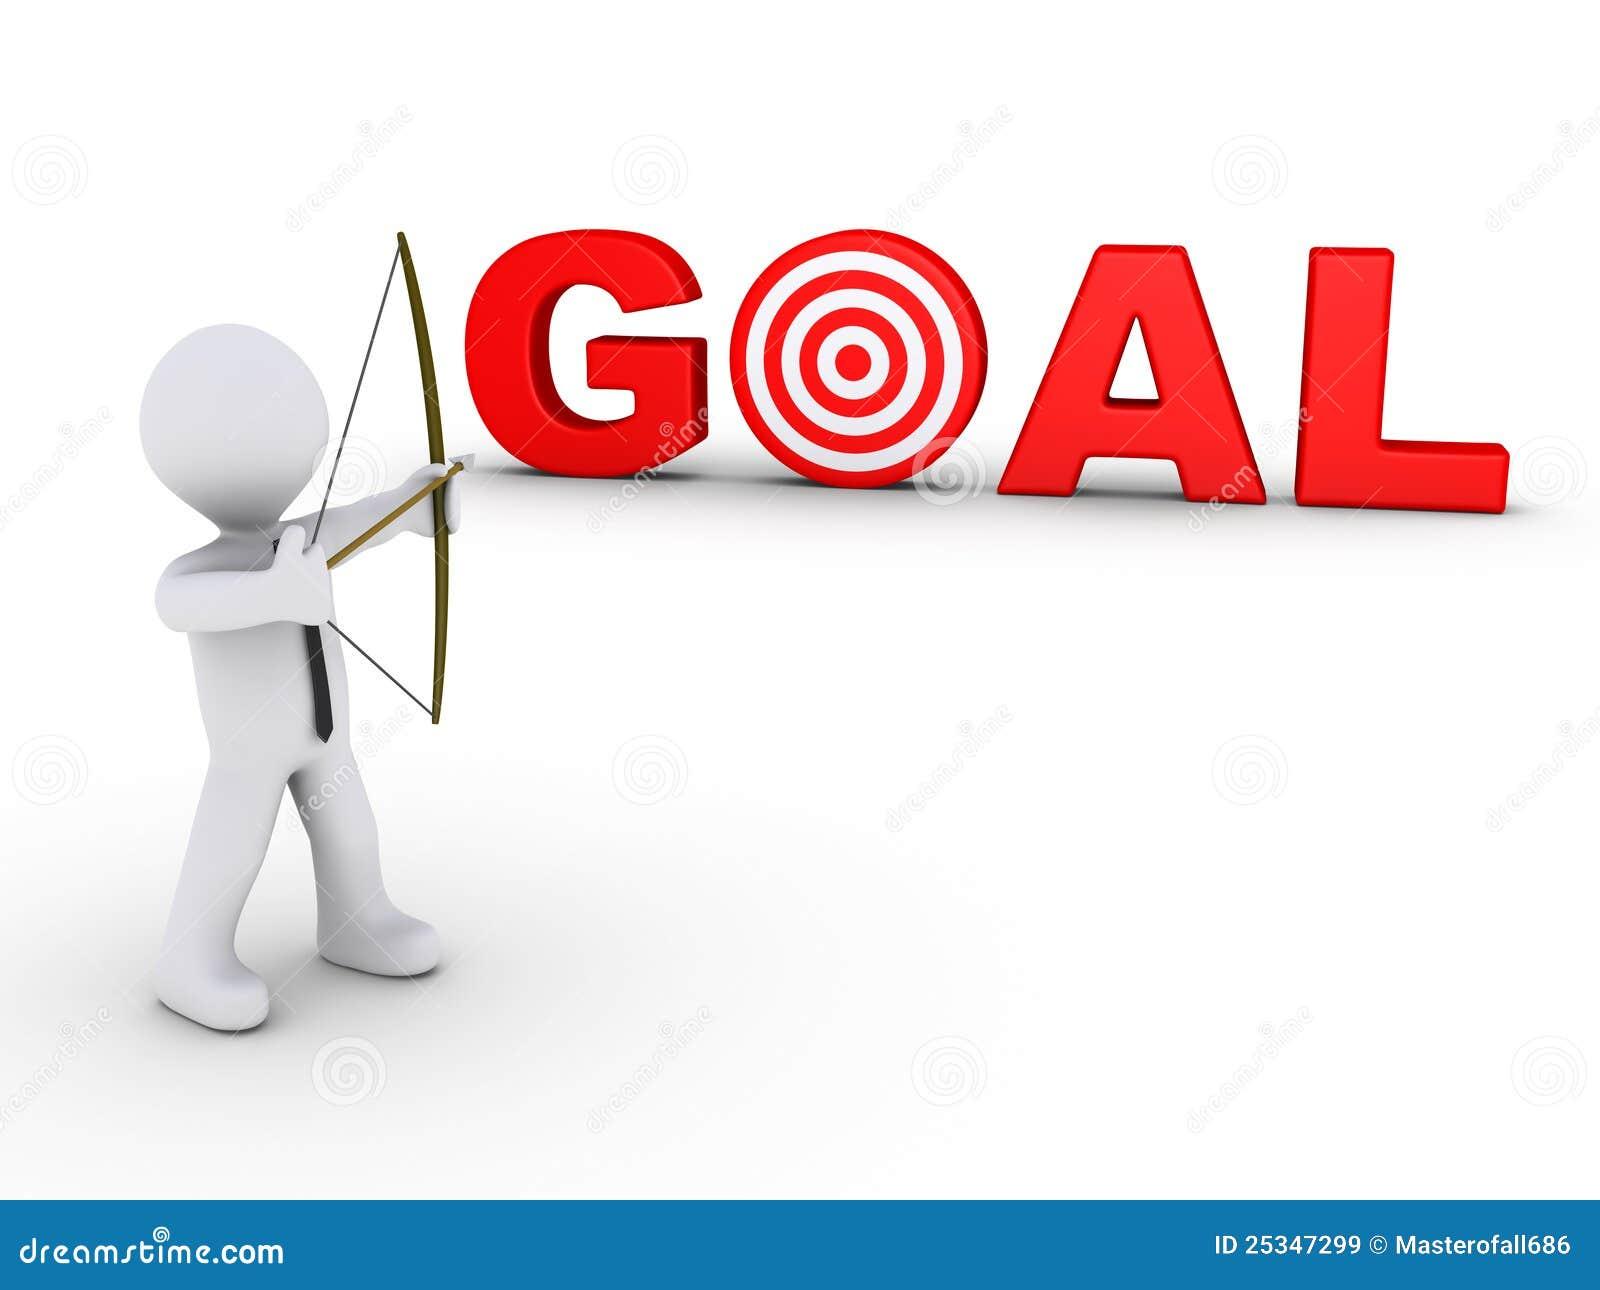 Goal setting goal settingbm goal setting reheart Choice Image